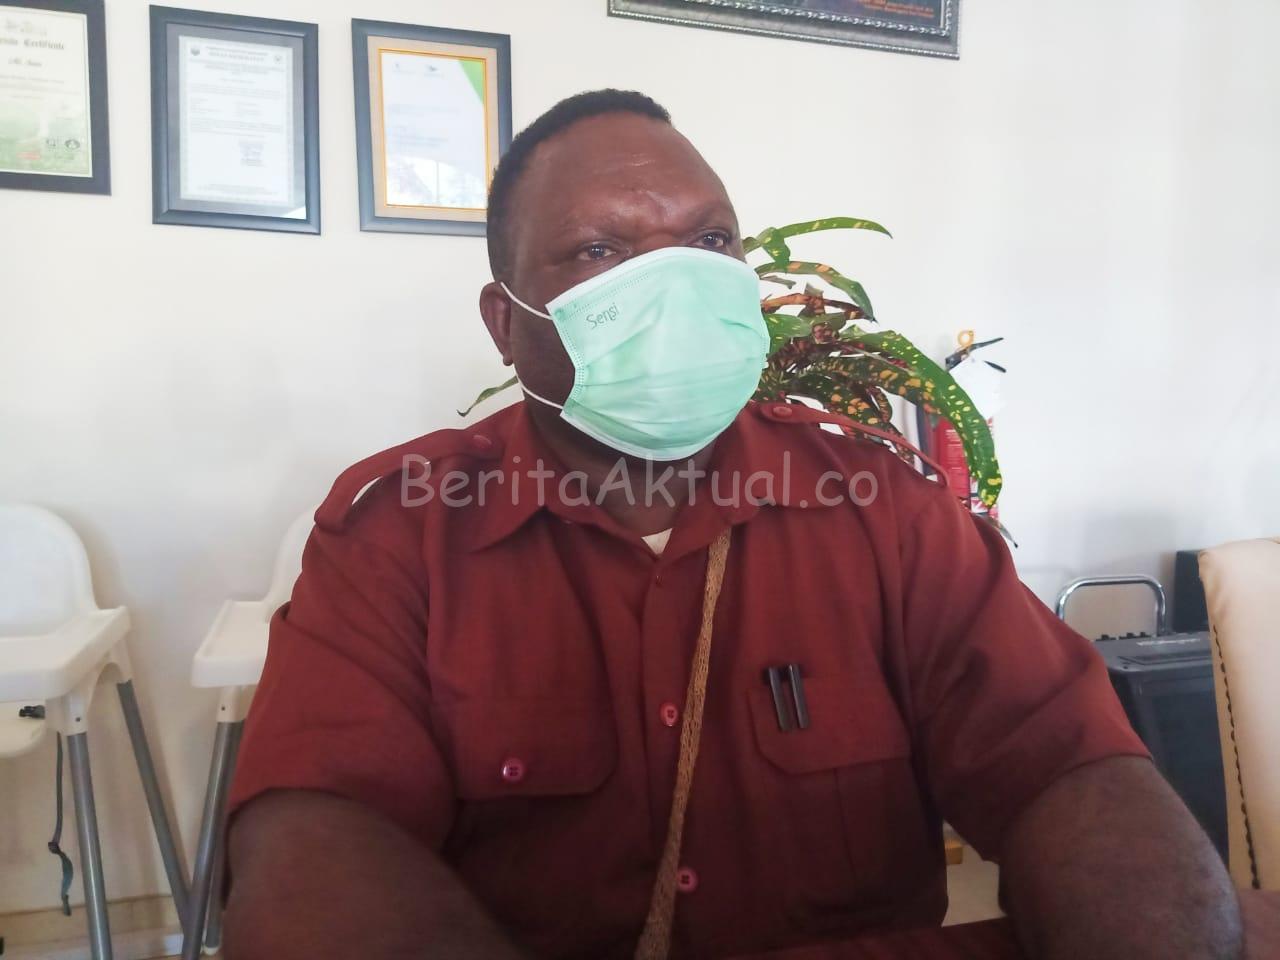 DPR Papua Barat Bentuk Pansus Awasi Dana Covid 197.8 Miliar 7 IMG 20200624 WA0036